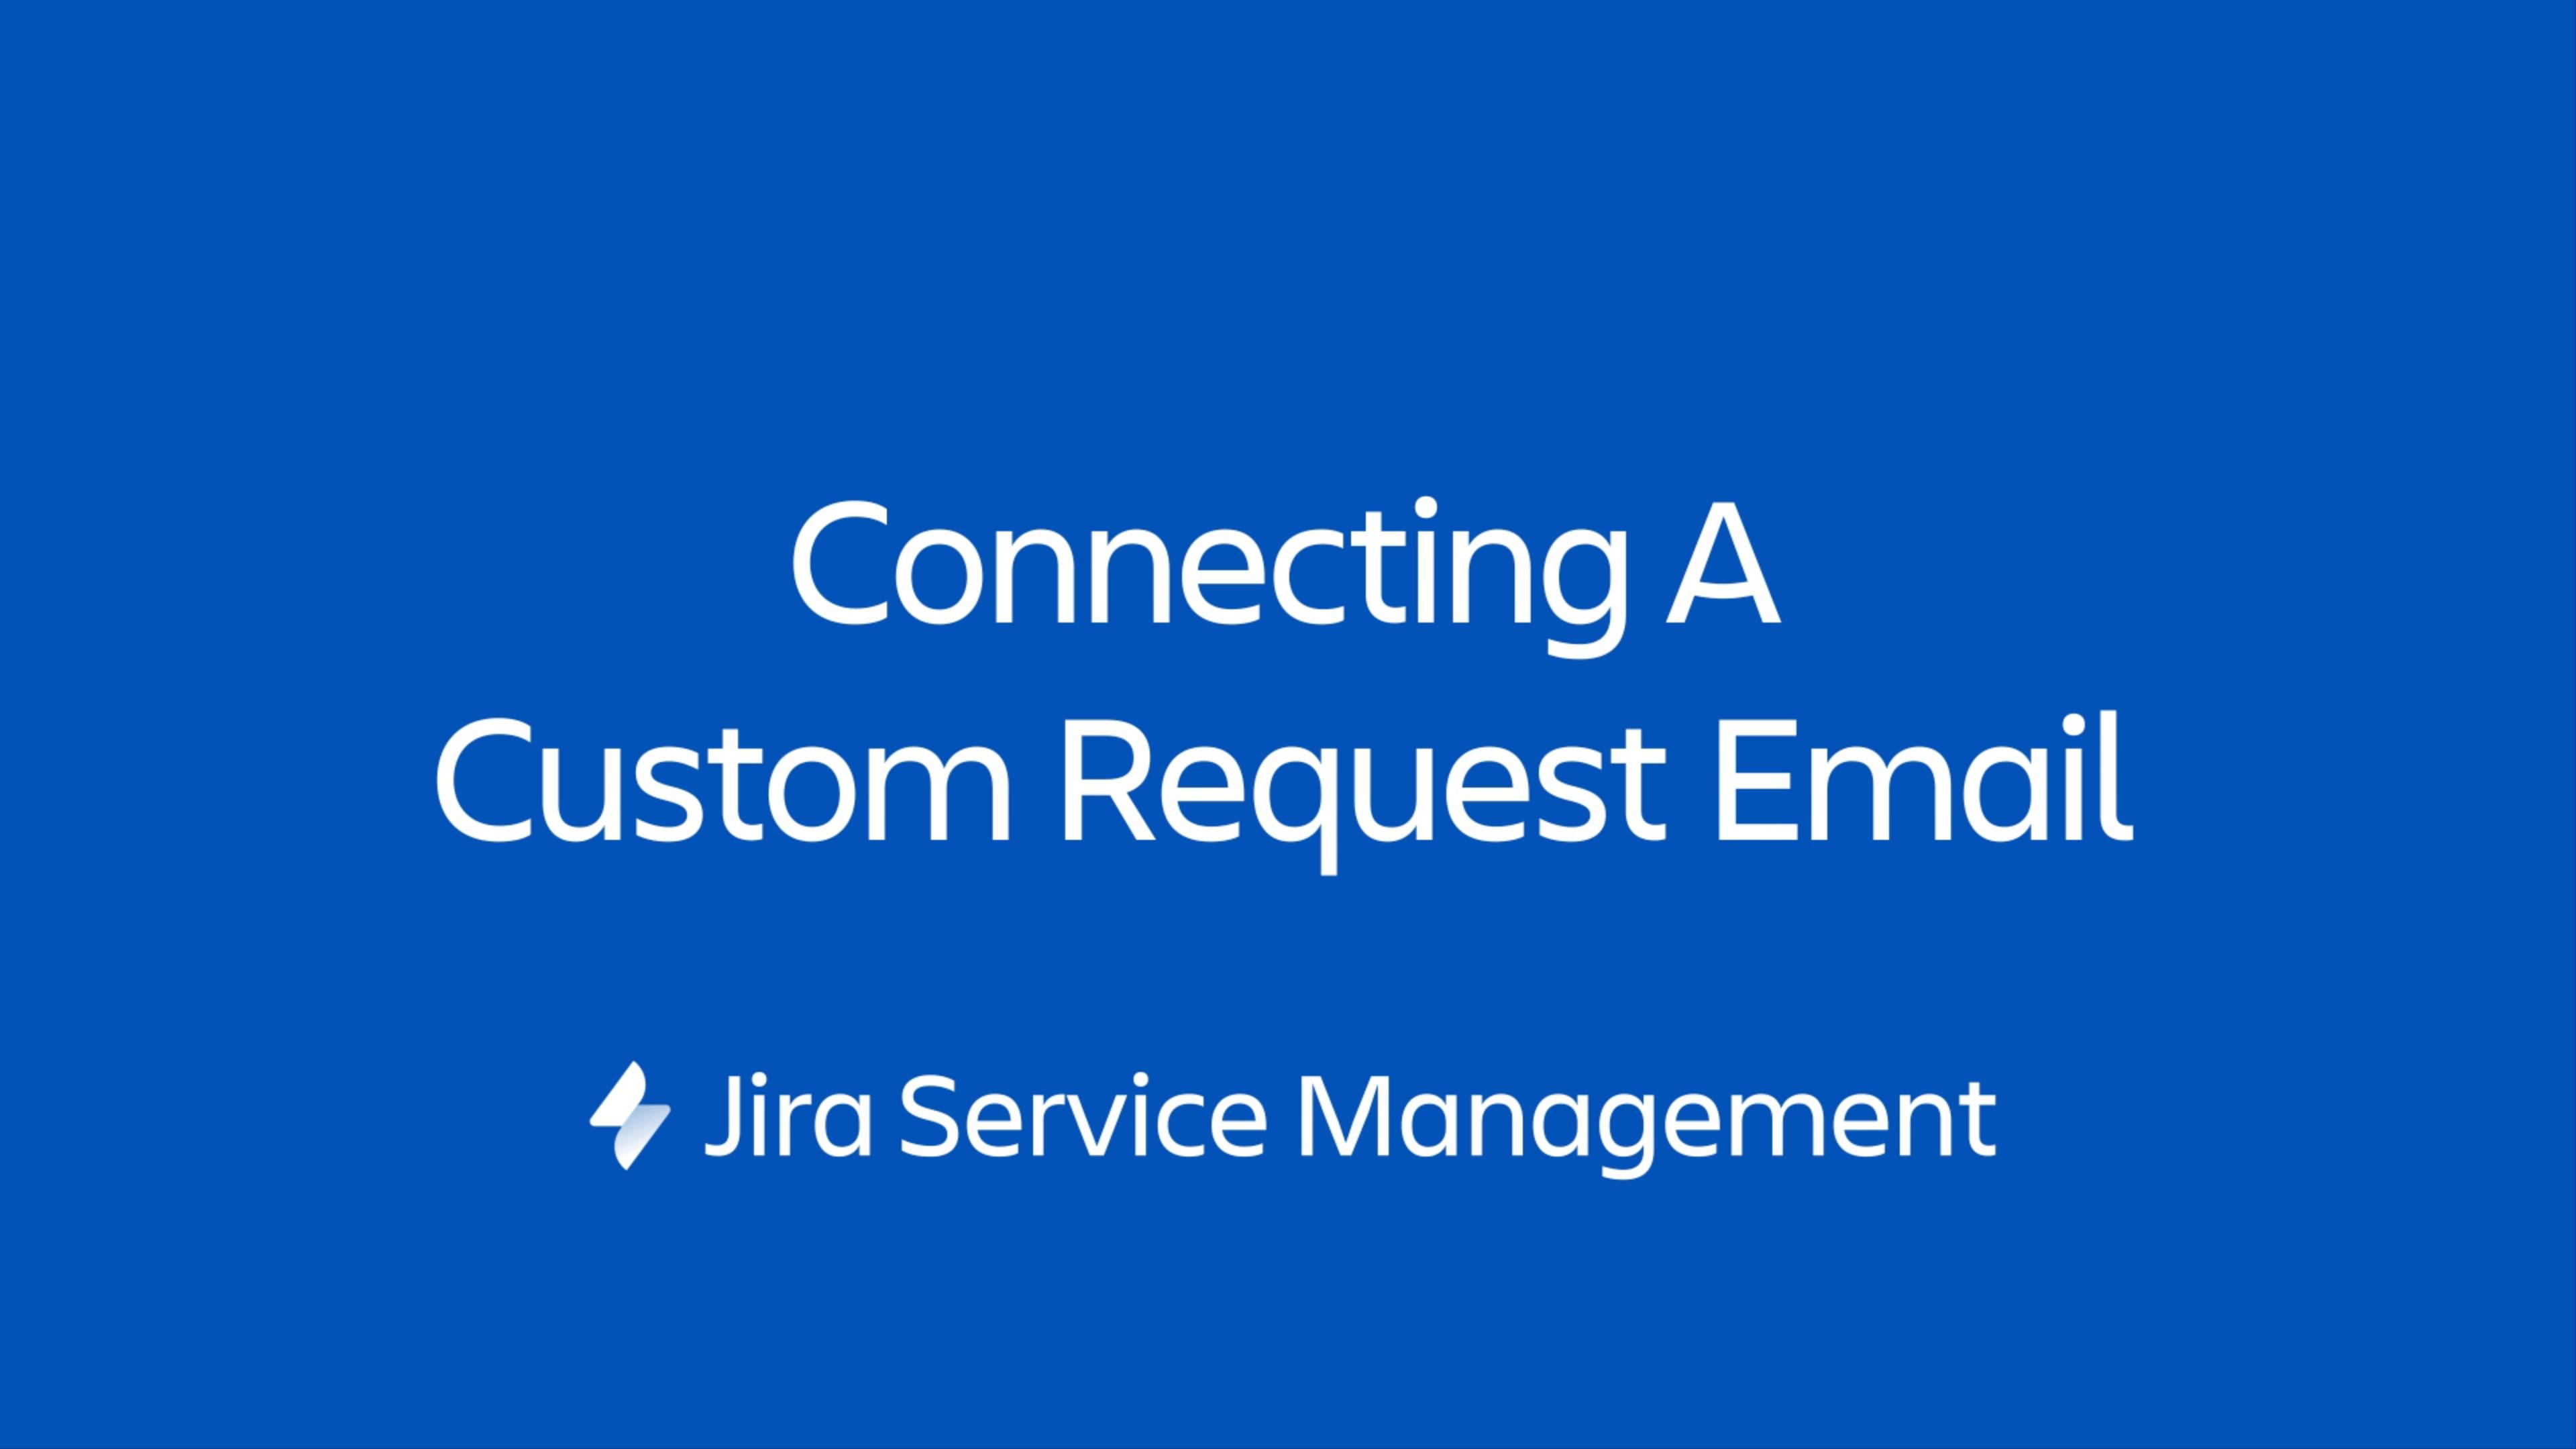 Conectar un correo electrónico personalizado para solicitudes